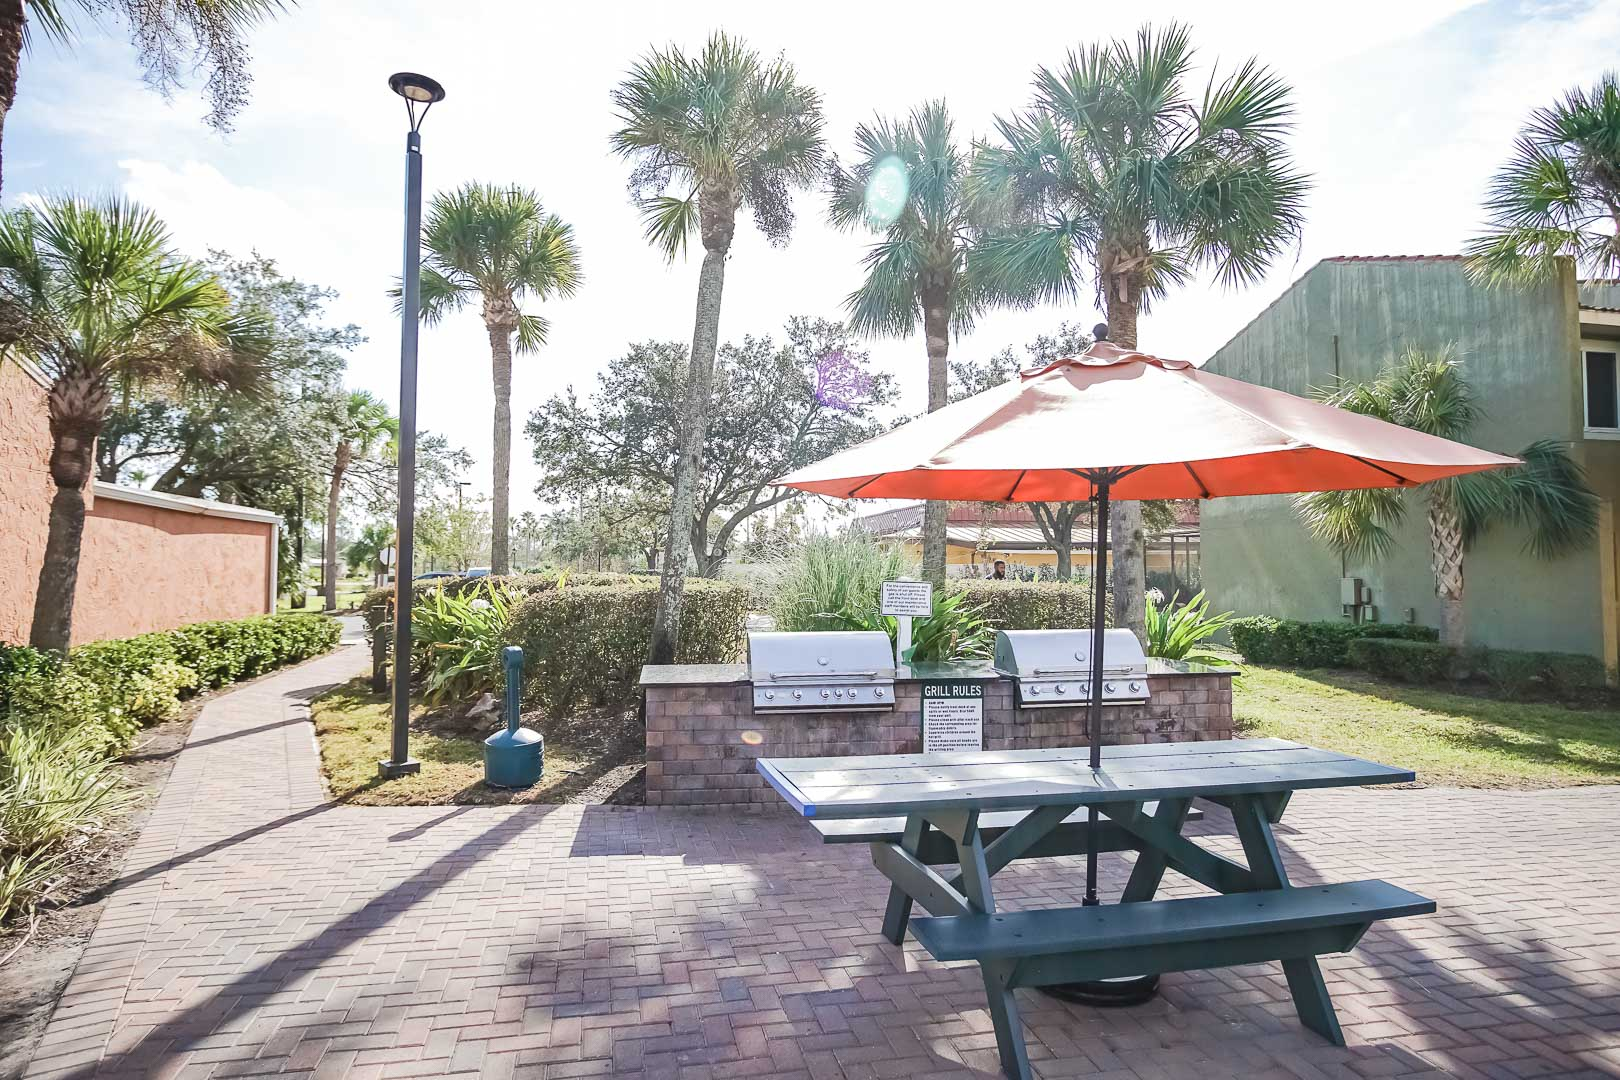 BBQ grills and sitting area at VRI's Fantasy World Resort in Florida.